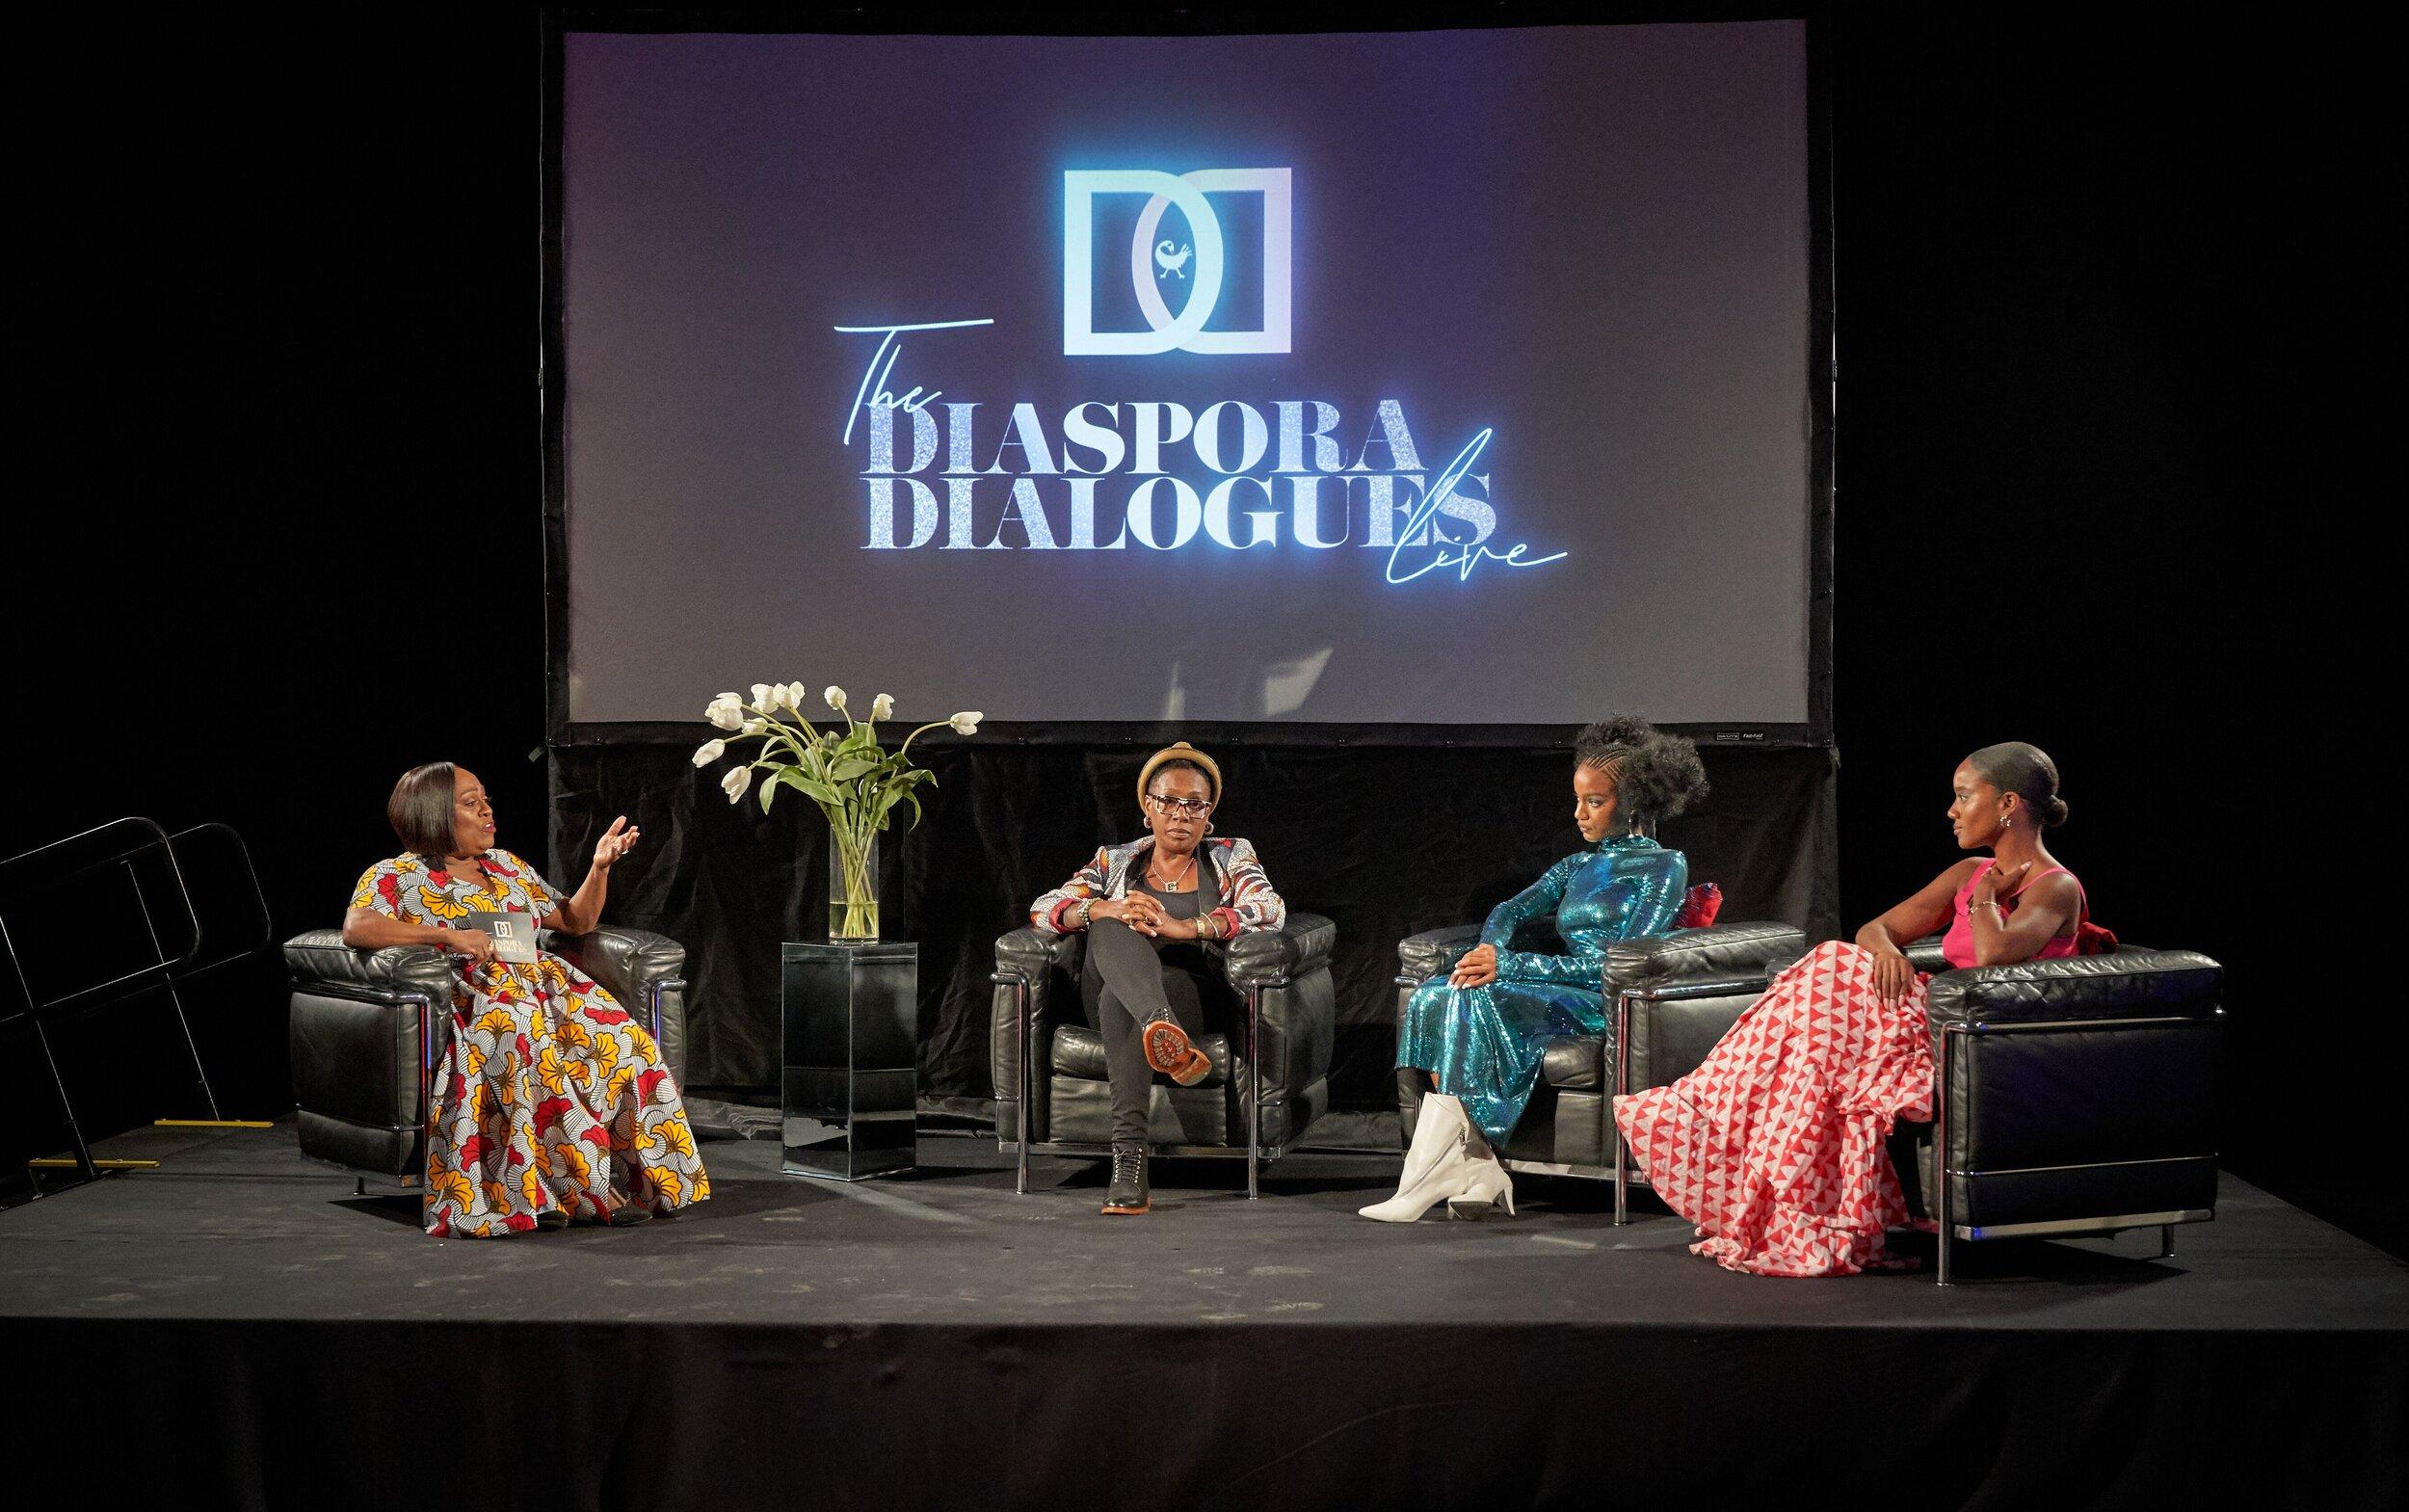 L-R Koshie Mills, Gina Yashere, Ebonee Davis, and Yootha Wong-Loi-Sing. (Photo Credit: Bobby Quillard/The Diaspora Dialogues)